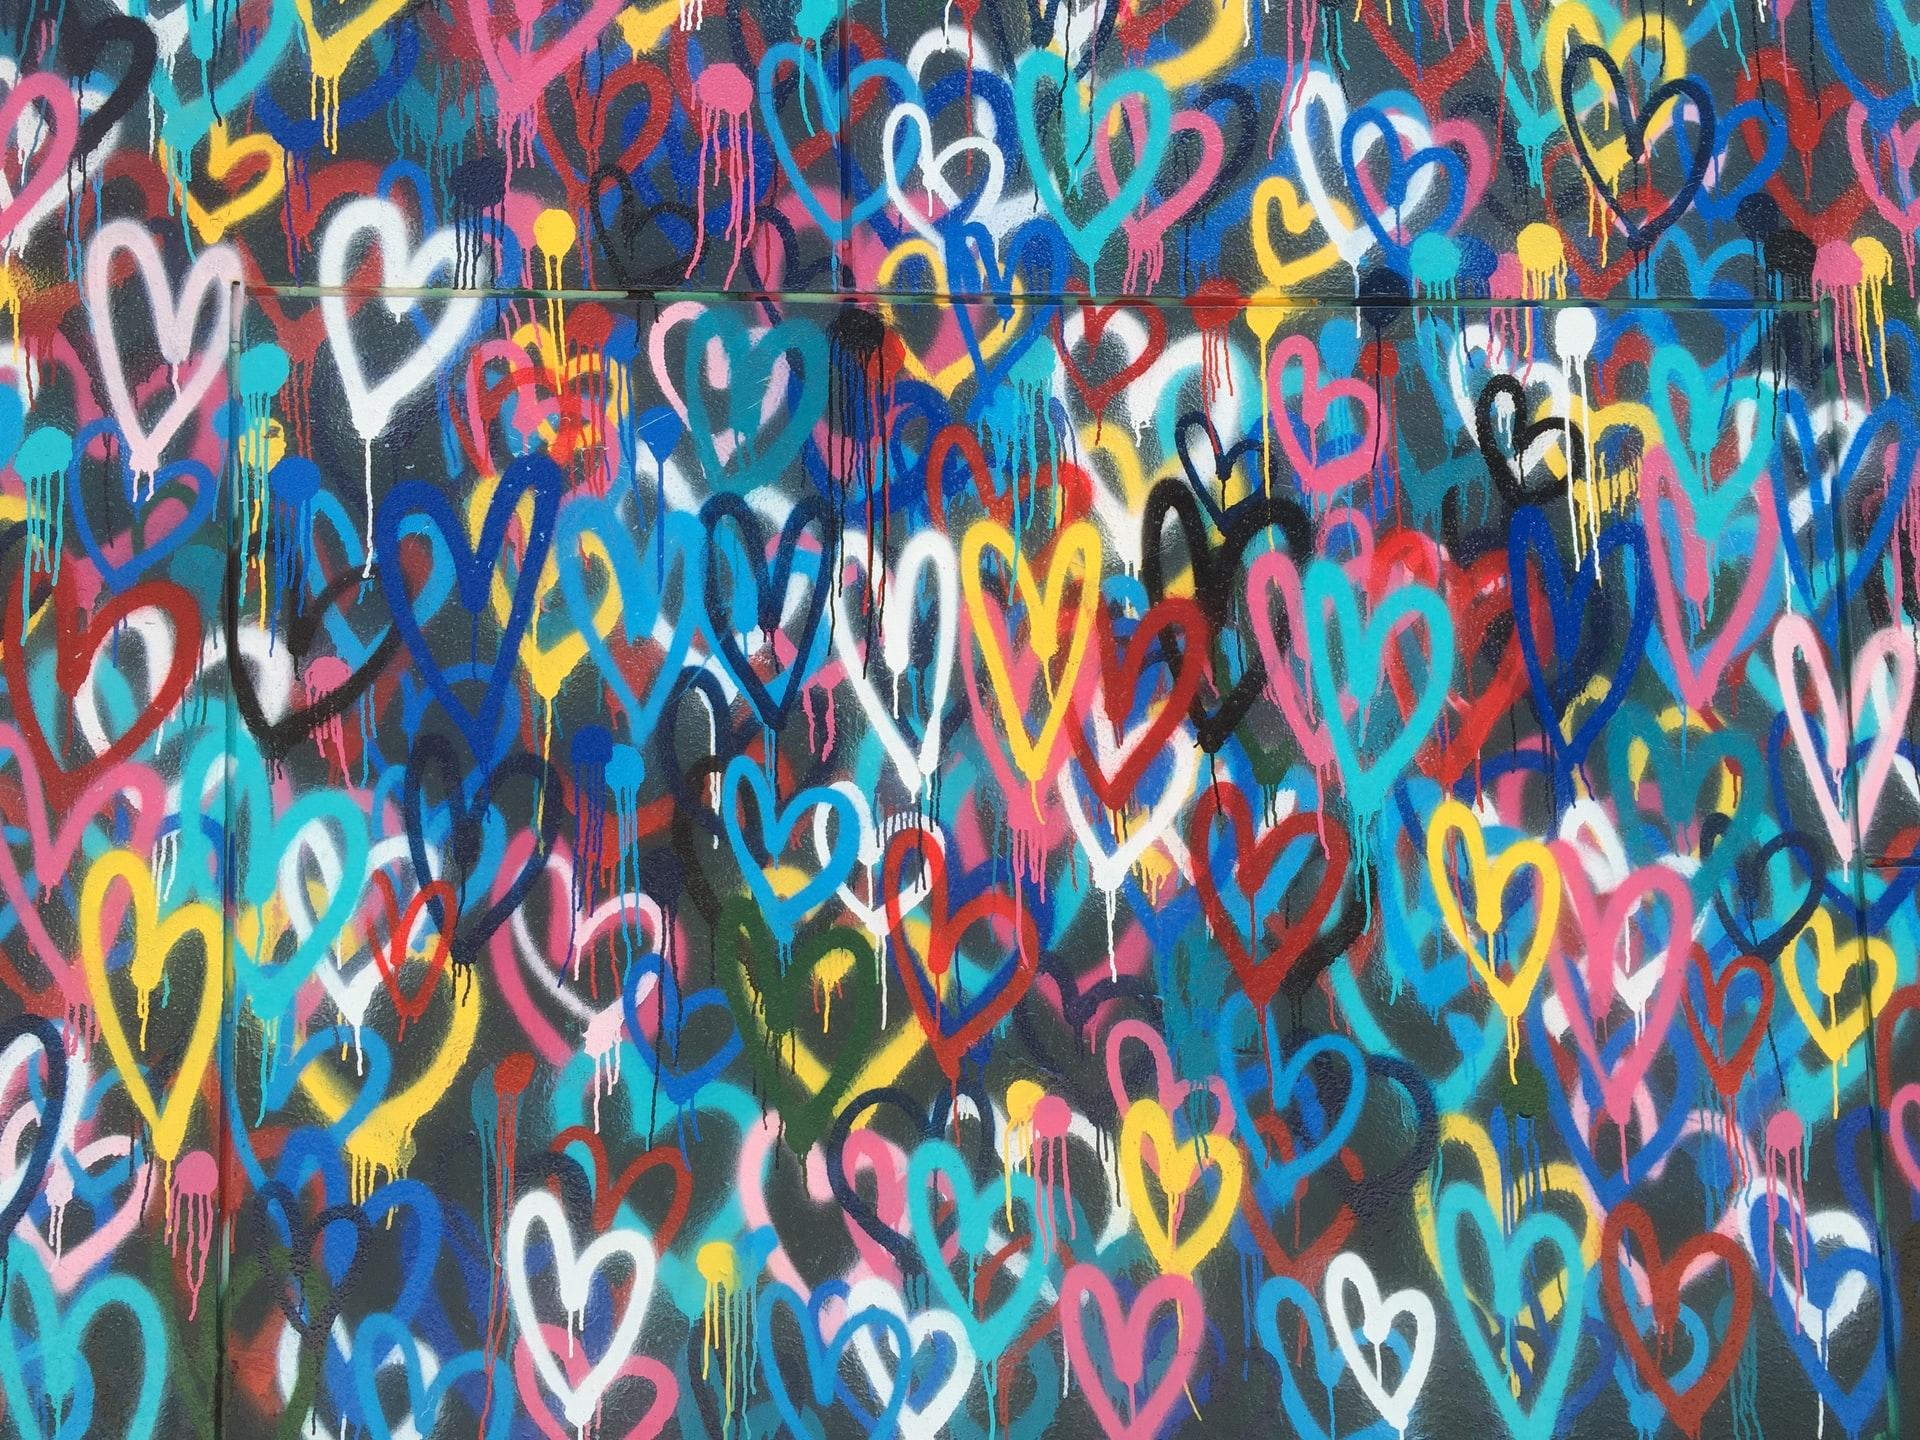 Multi-coloured love hearts - graffiti on a wall - photo: Unsplash